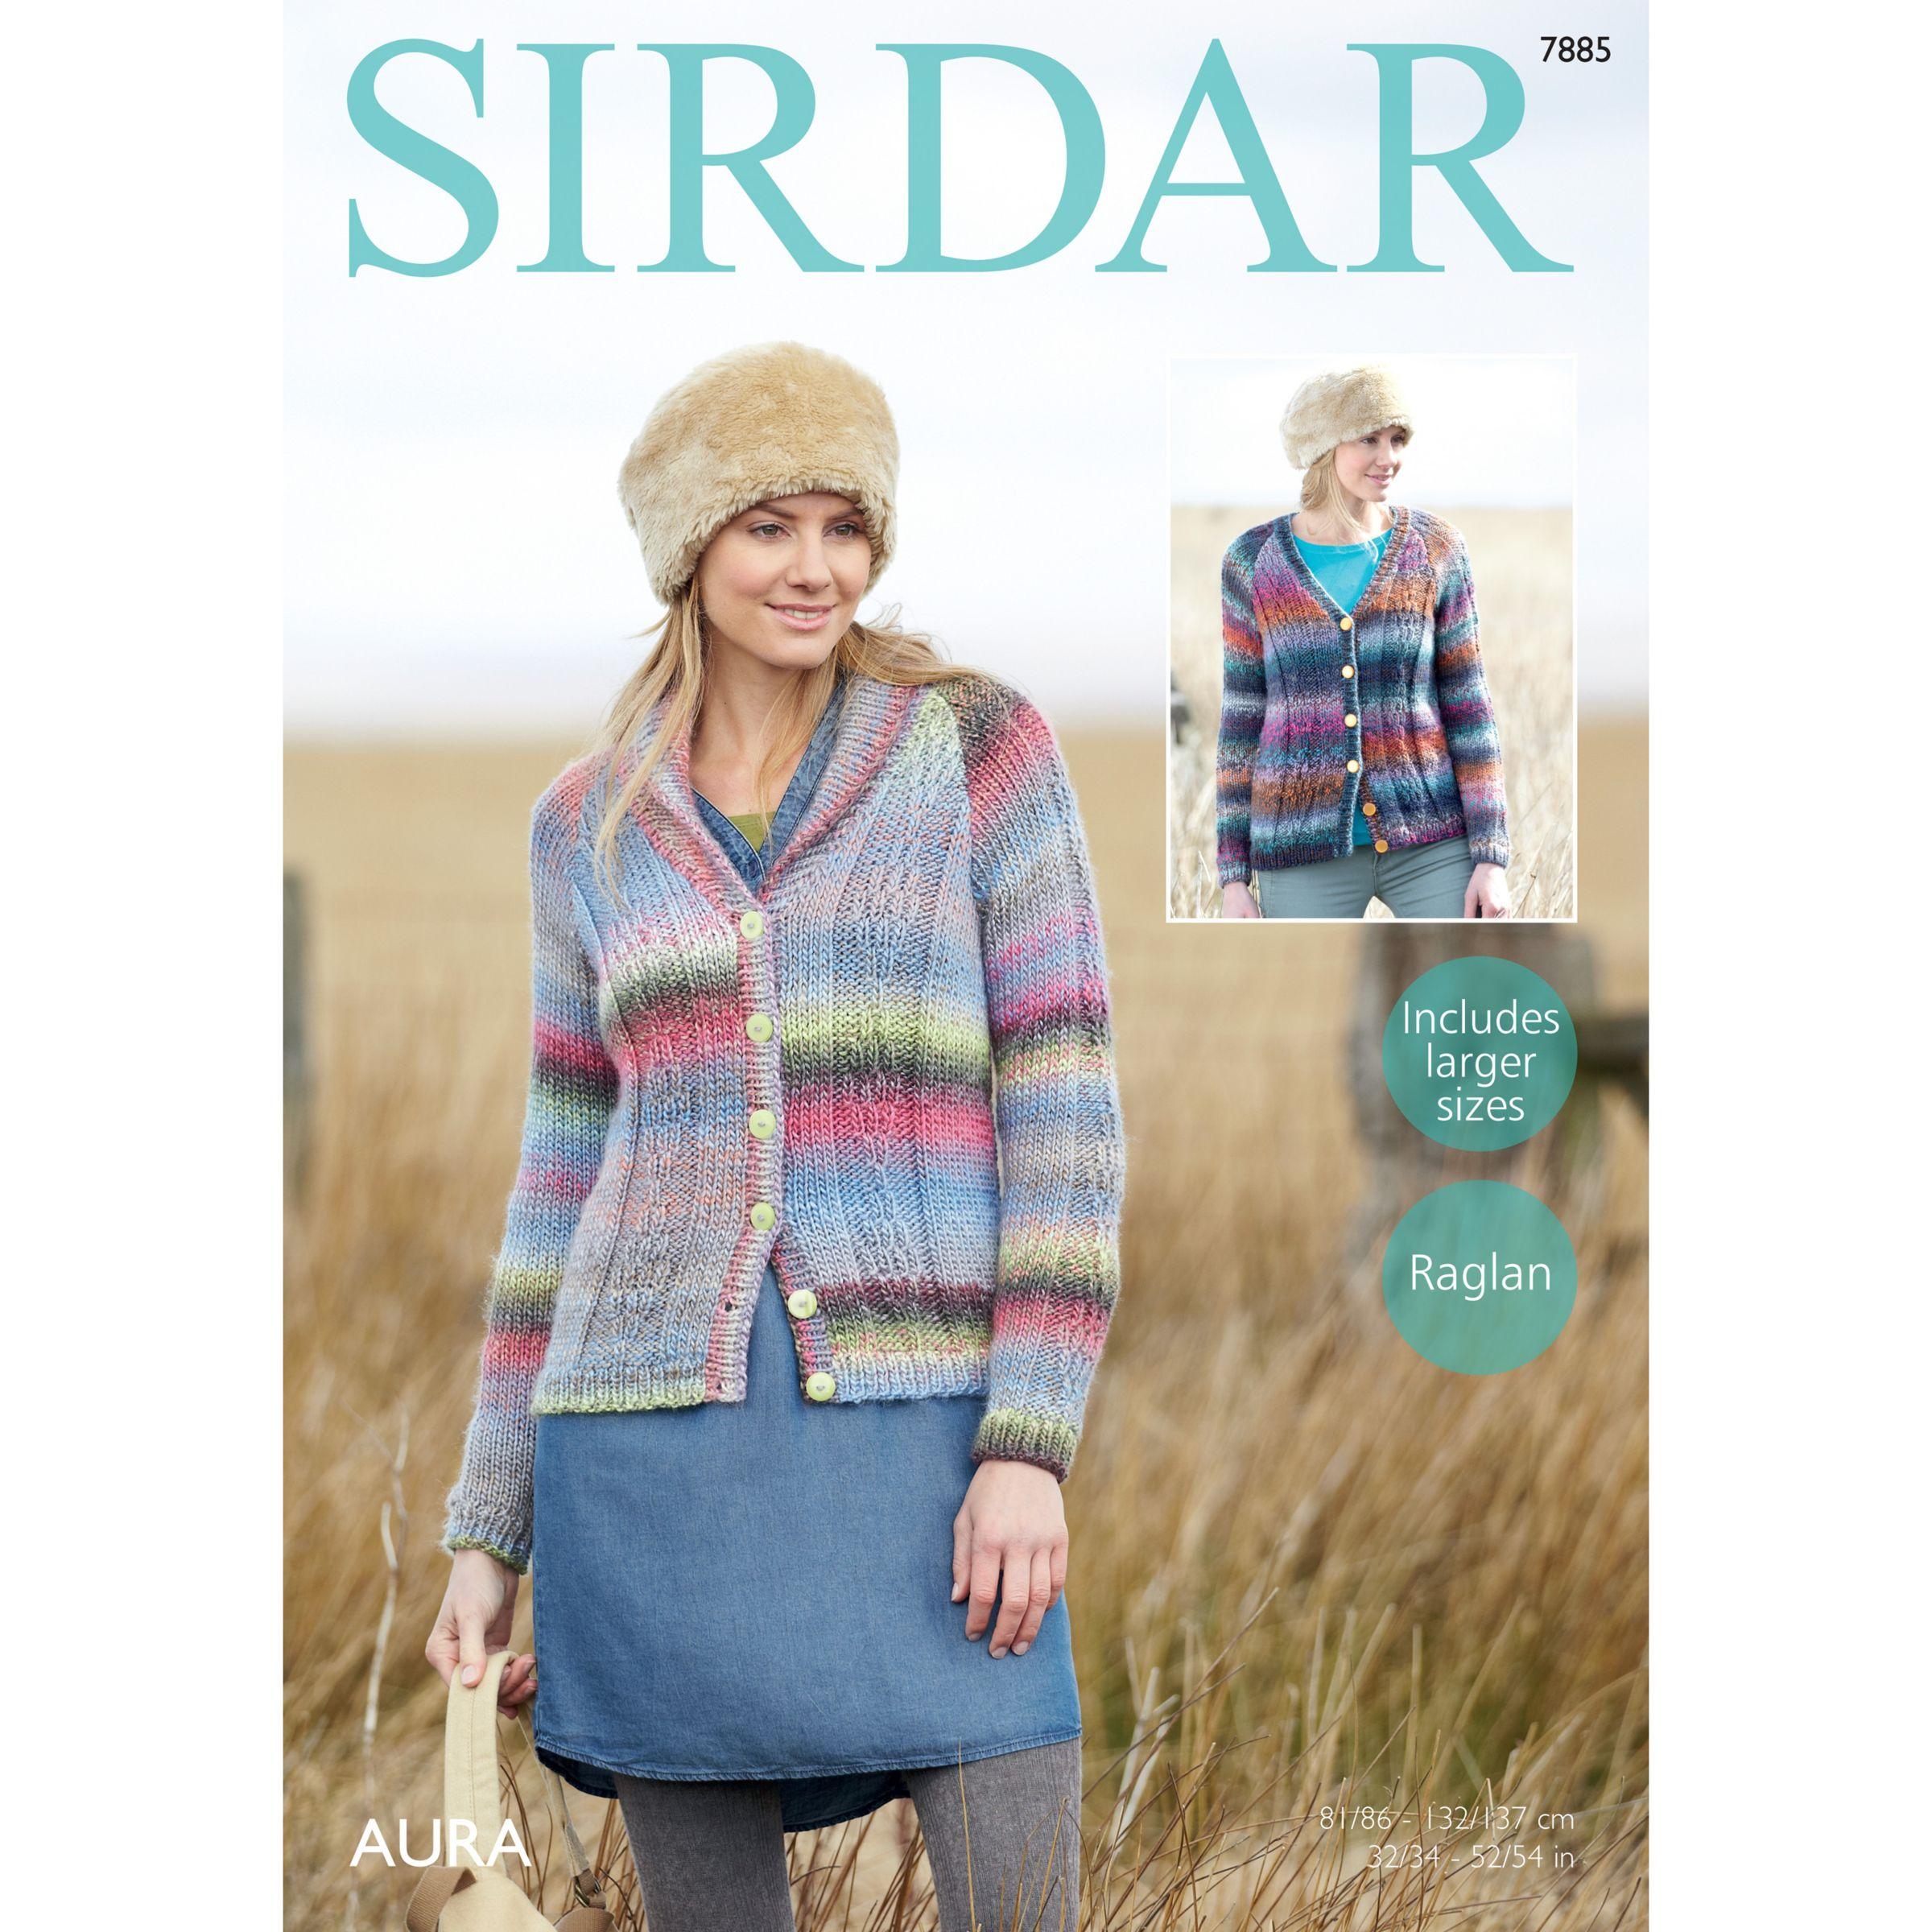 Sirdar Sirdar Aura Chunky Women's Cardigan Knitting Pattern, 7885